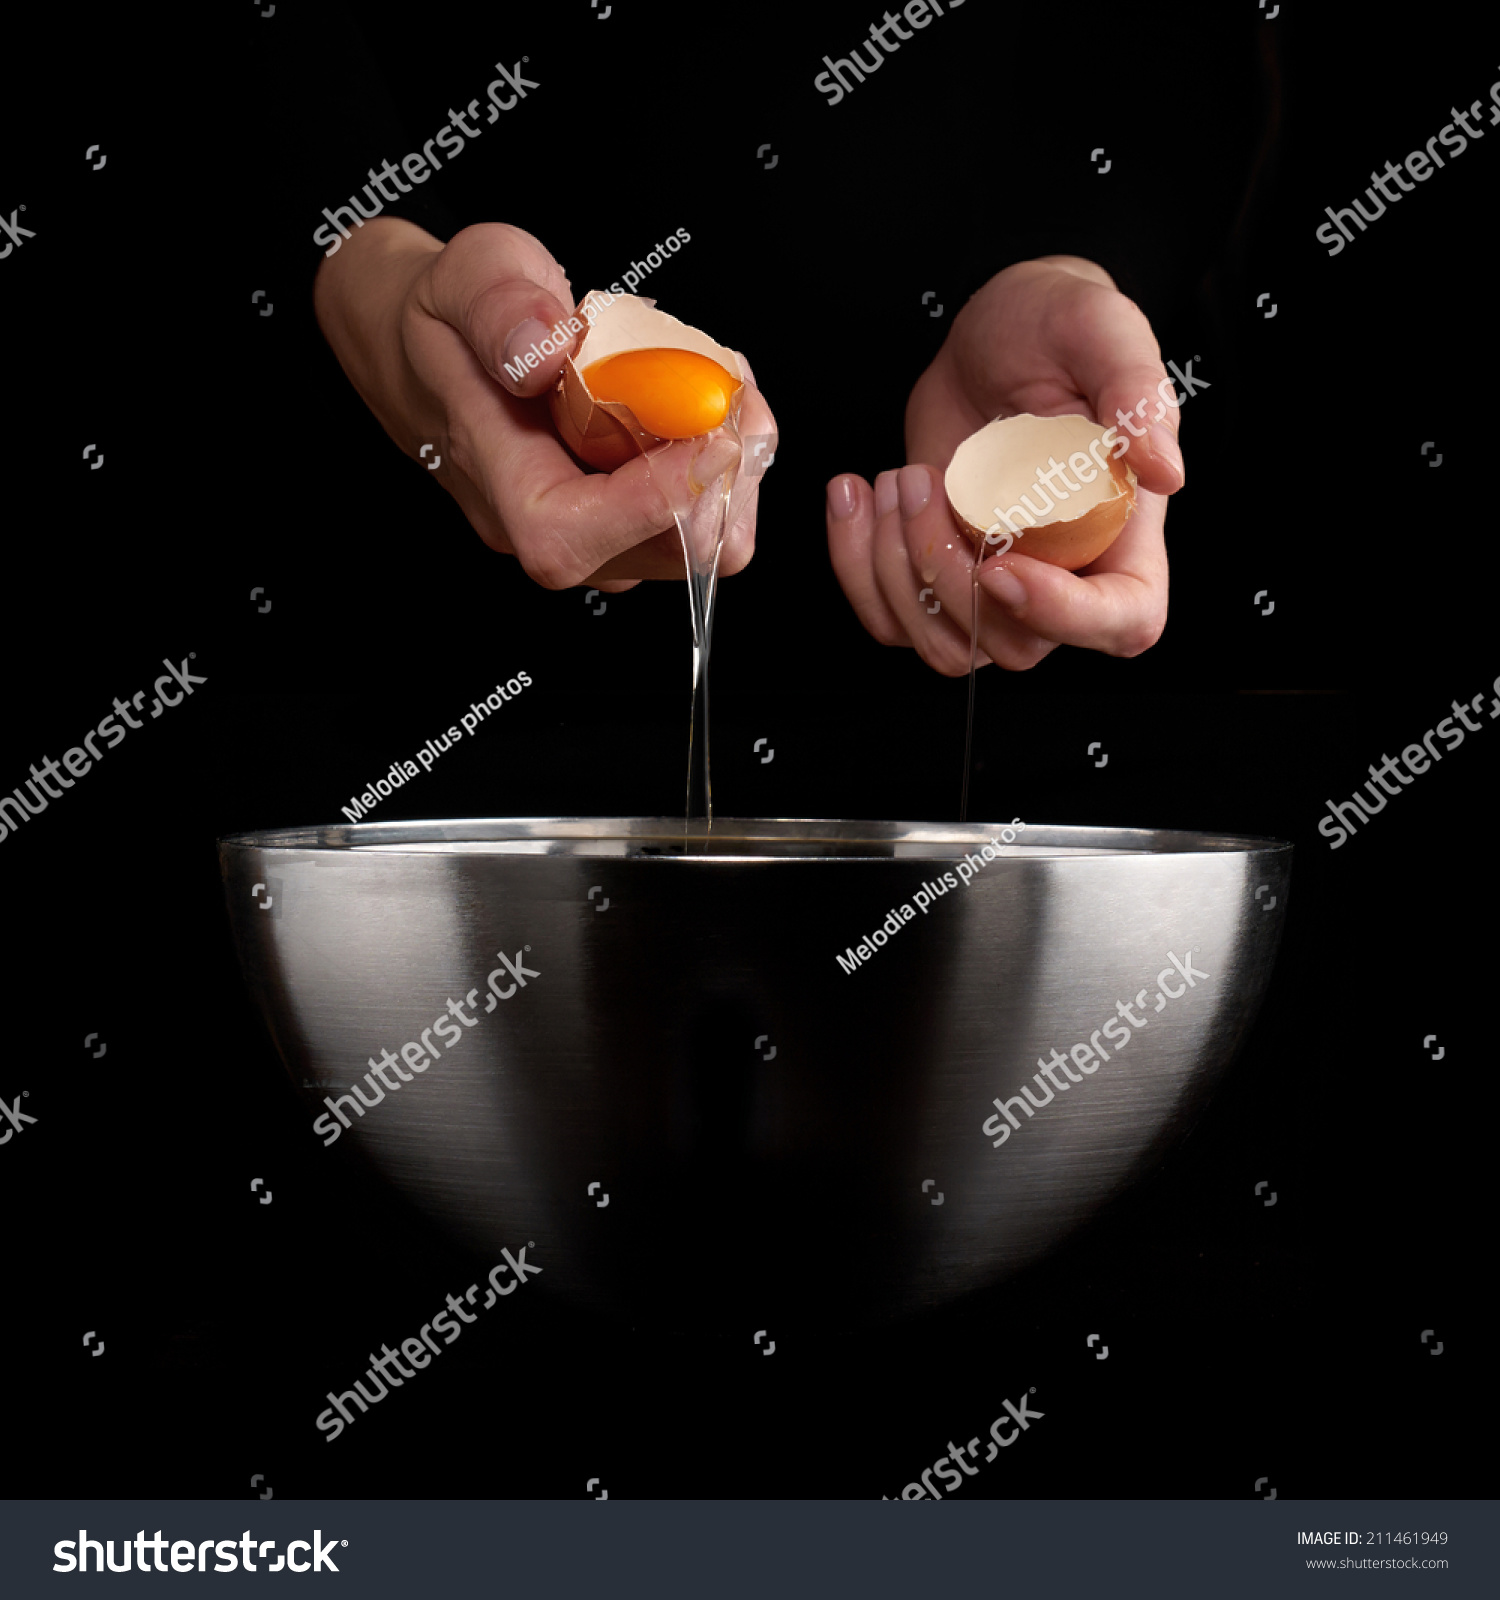 egg yolk falling - photo #6